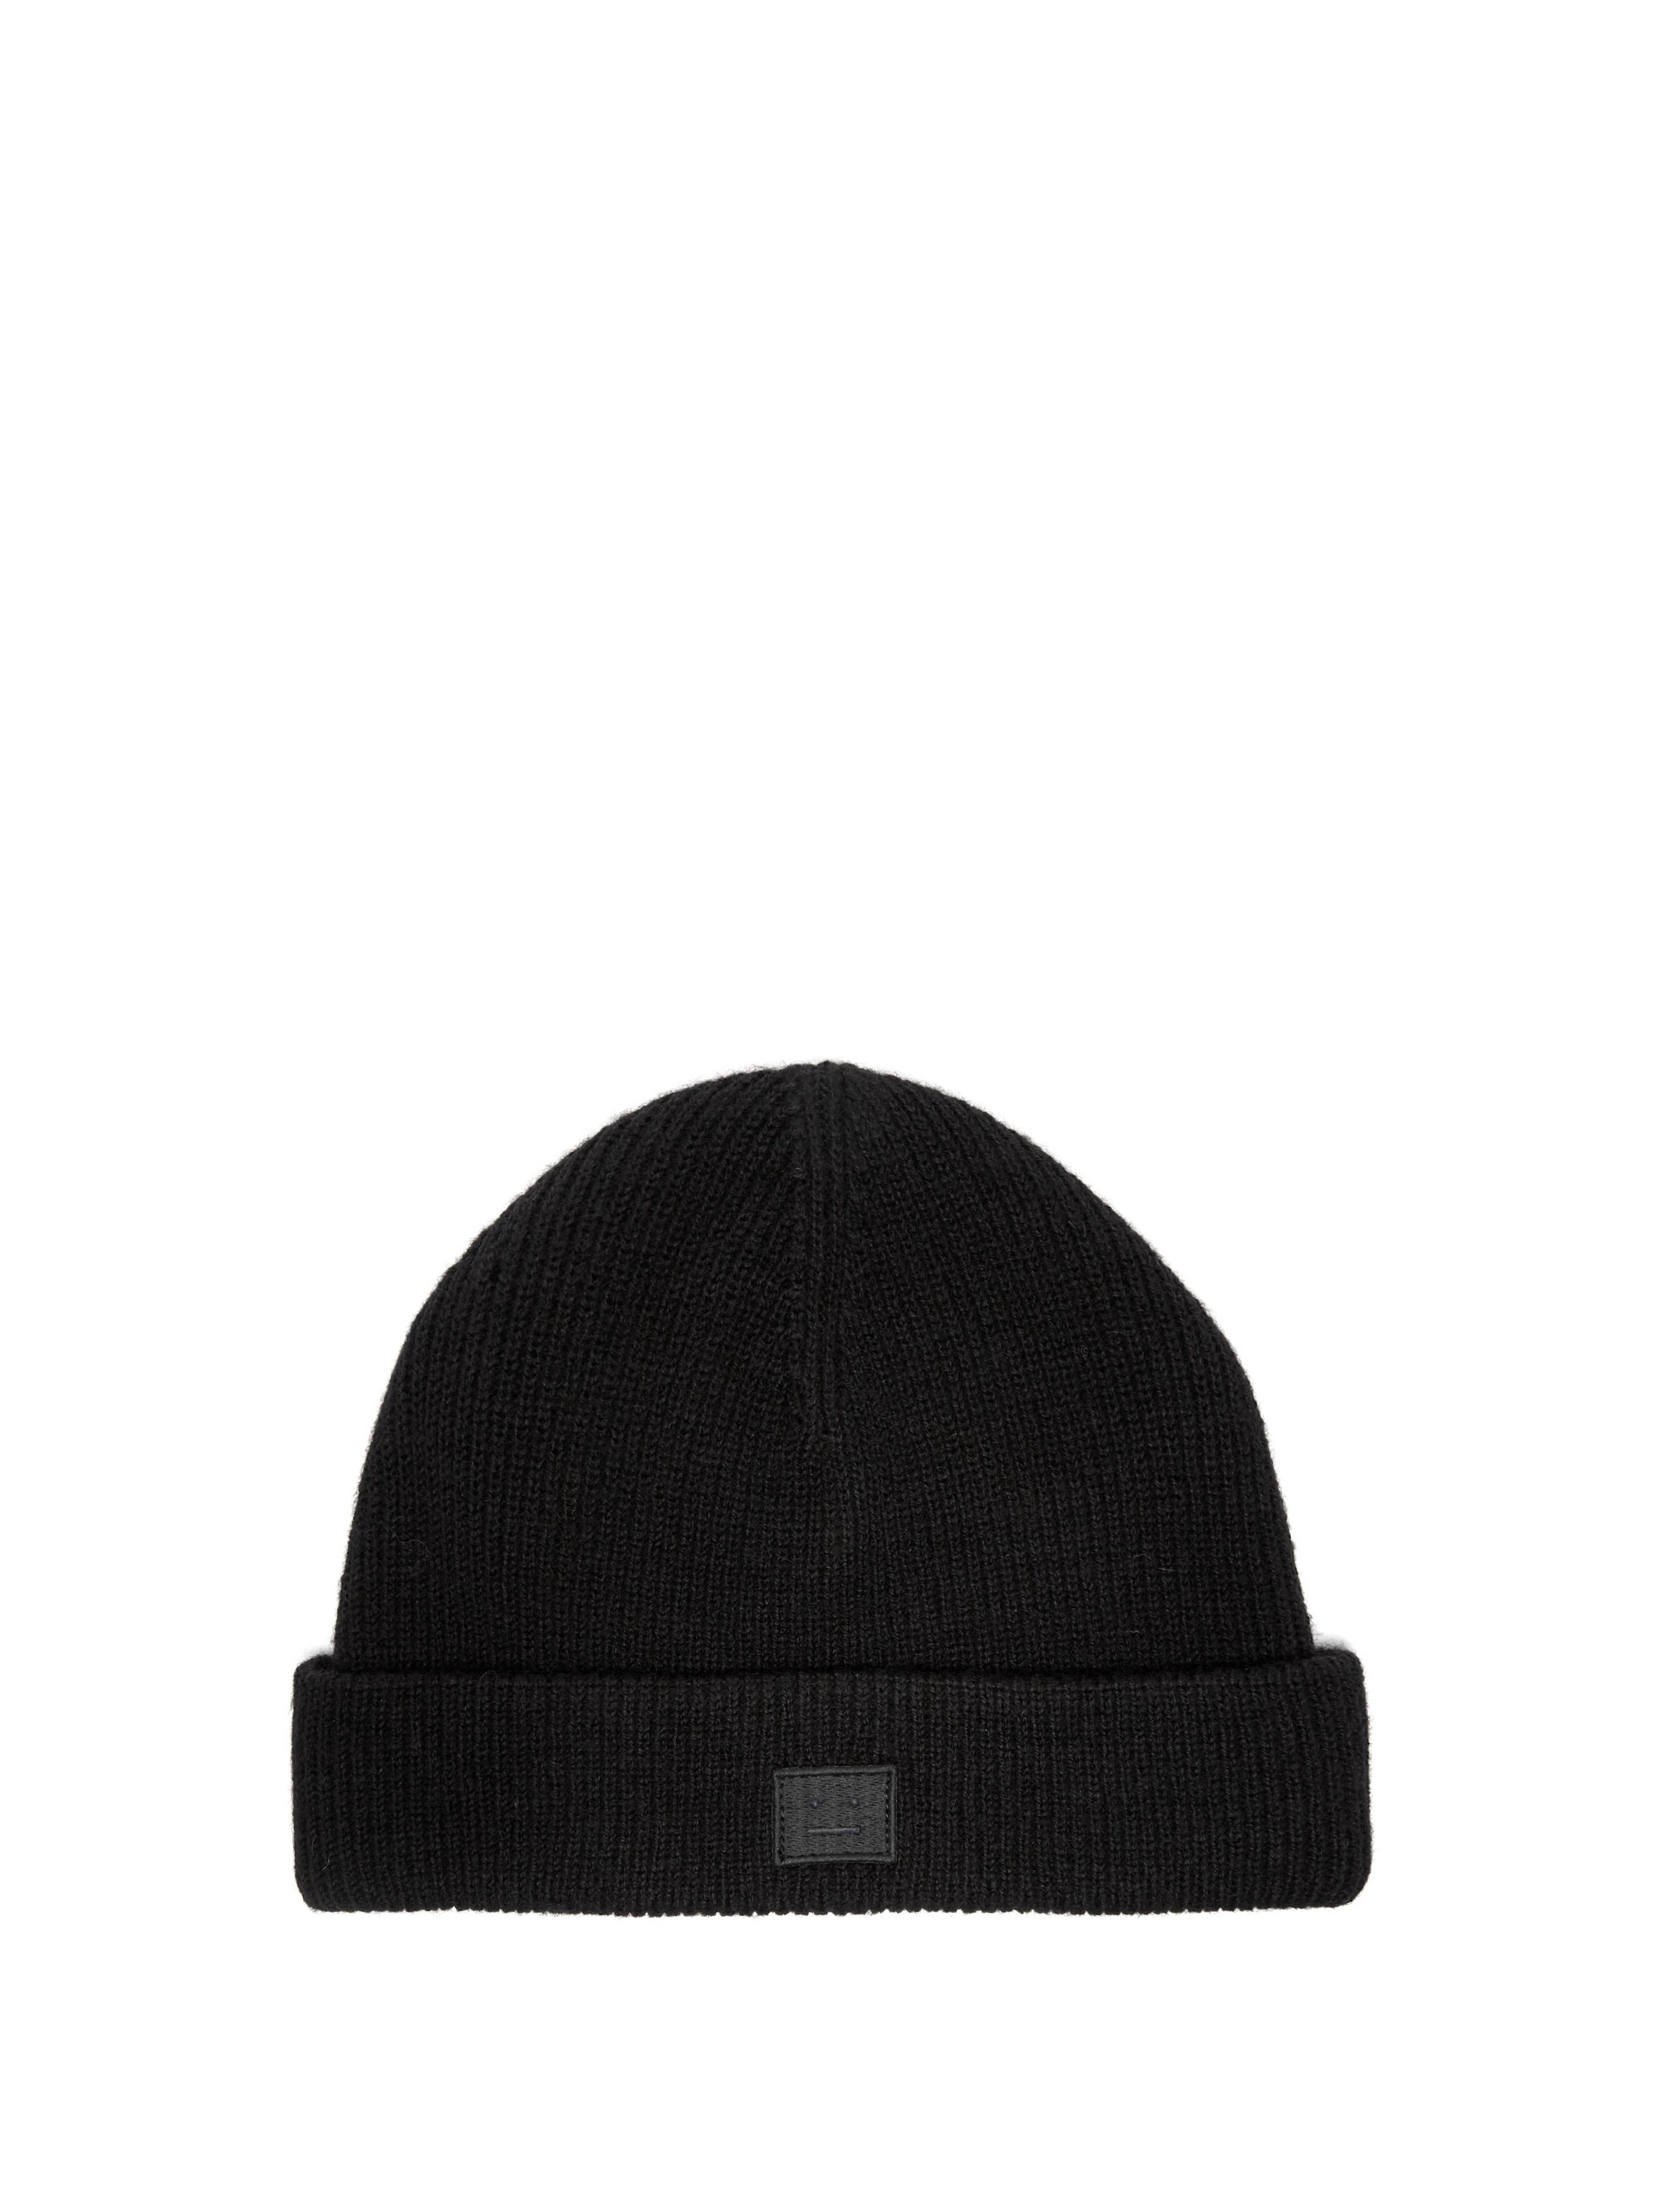 3c111fe71b3 Acne Studios Kansy Face Wool Blend Beanie Hat in Black for Men - Lyst